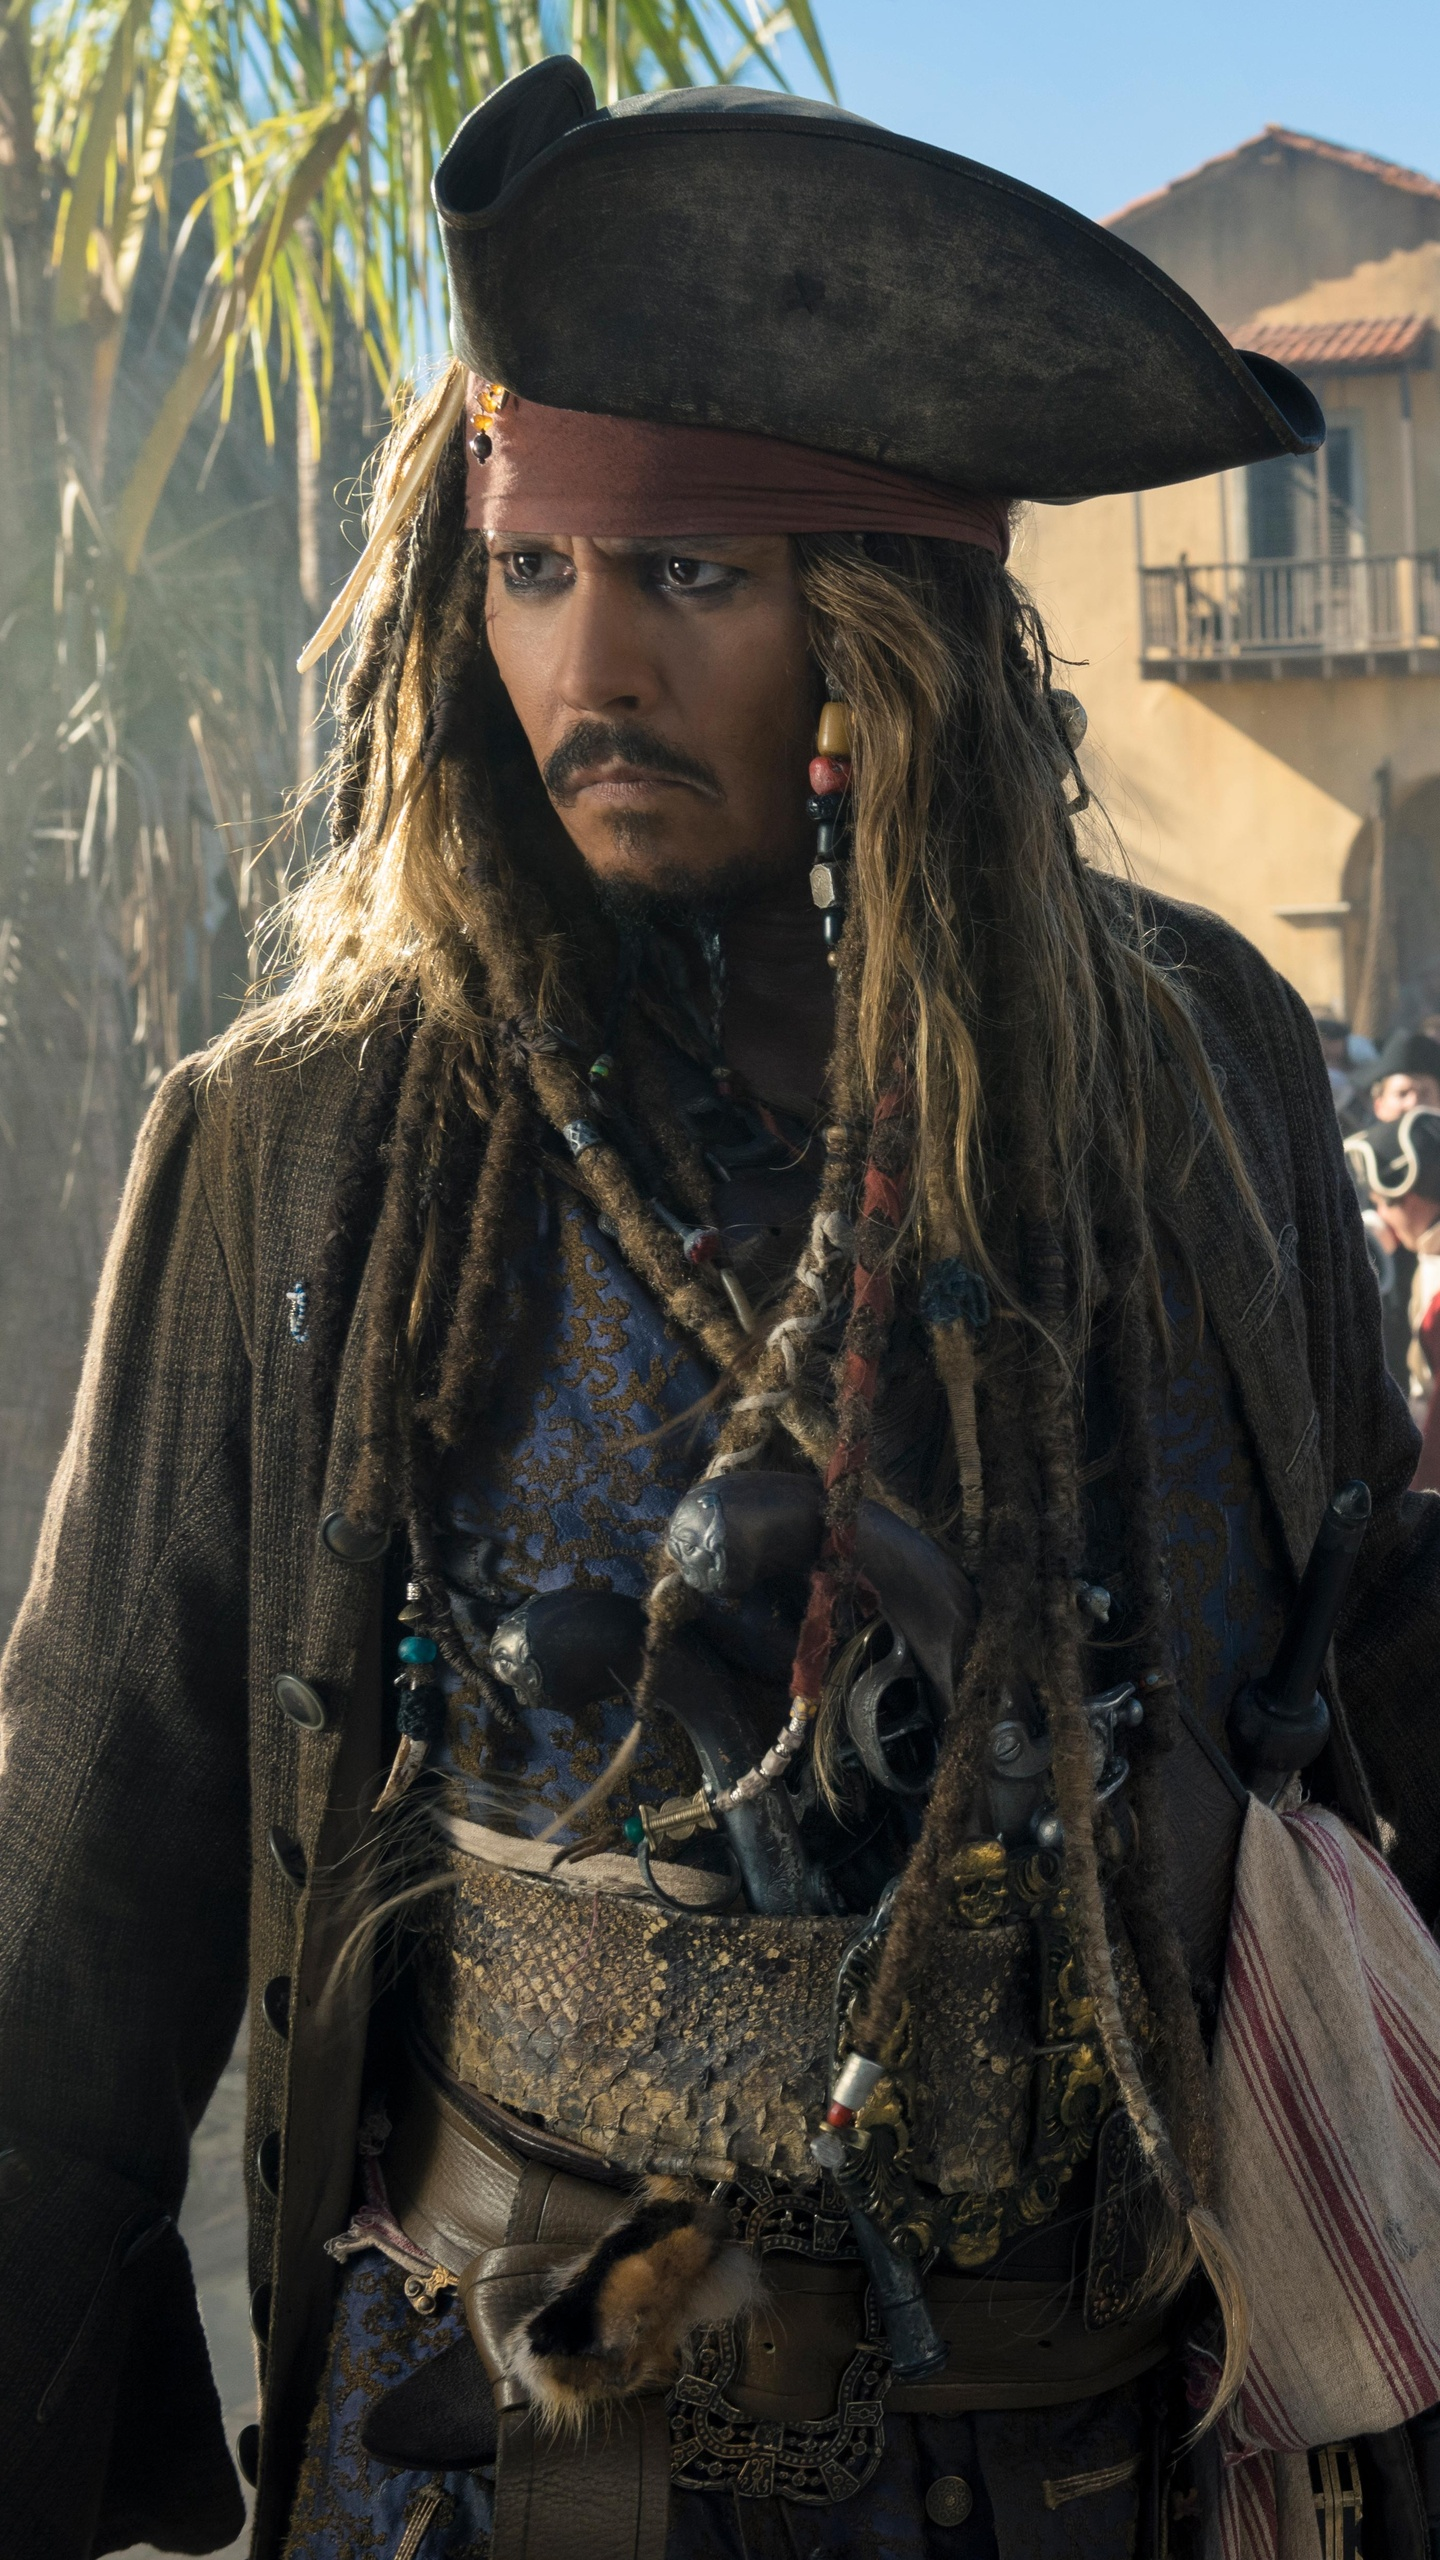 johnny-depp-pirates-of-the-caribbean-dead-men-tell-no-tales-6e-1440x2560